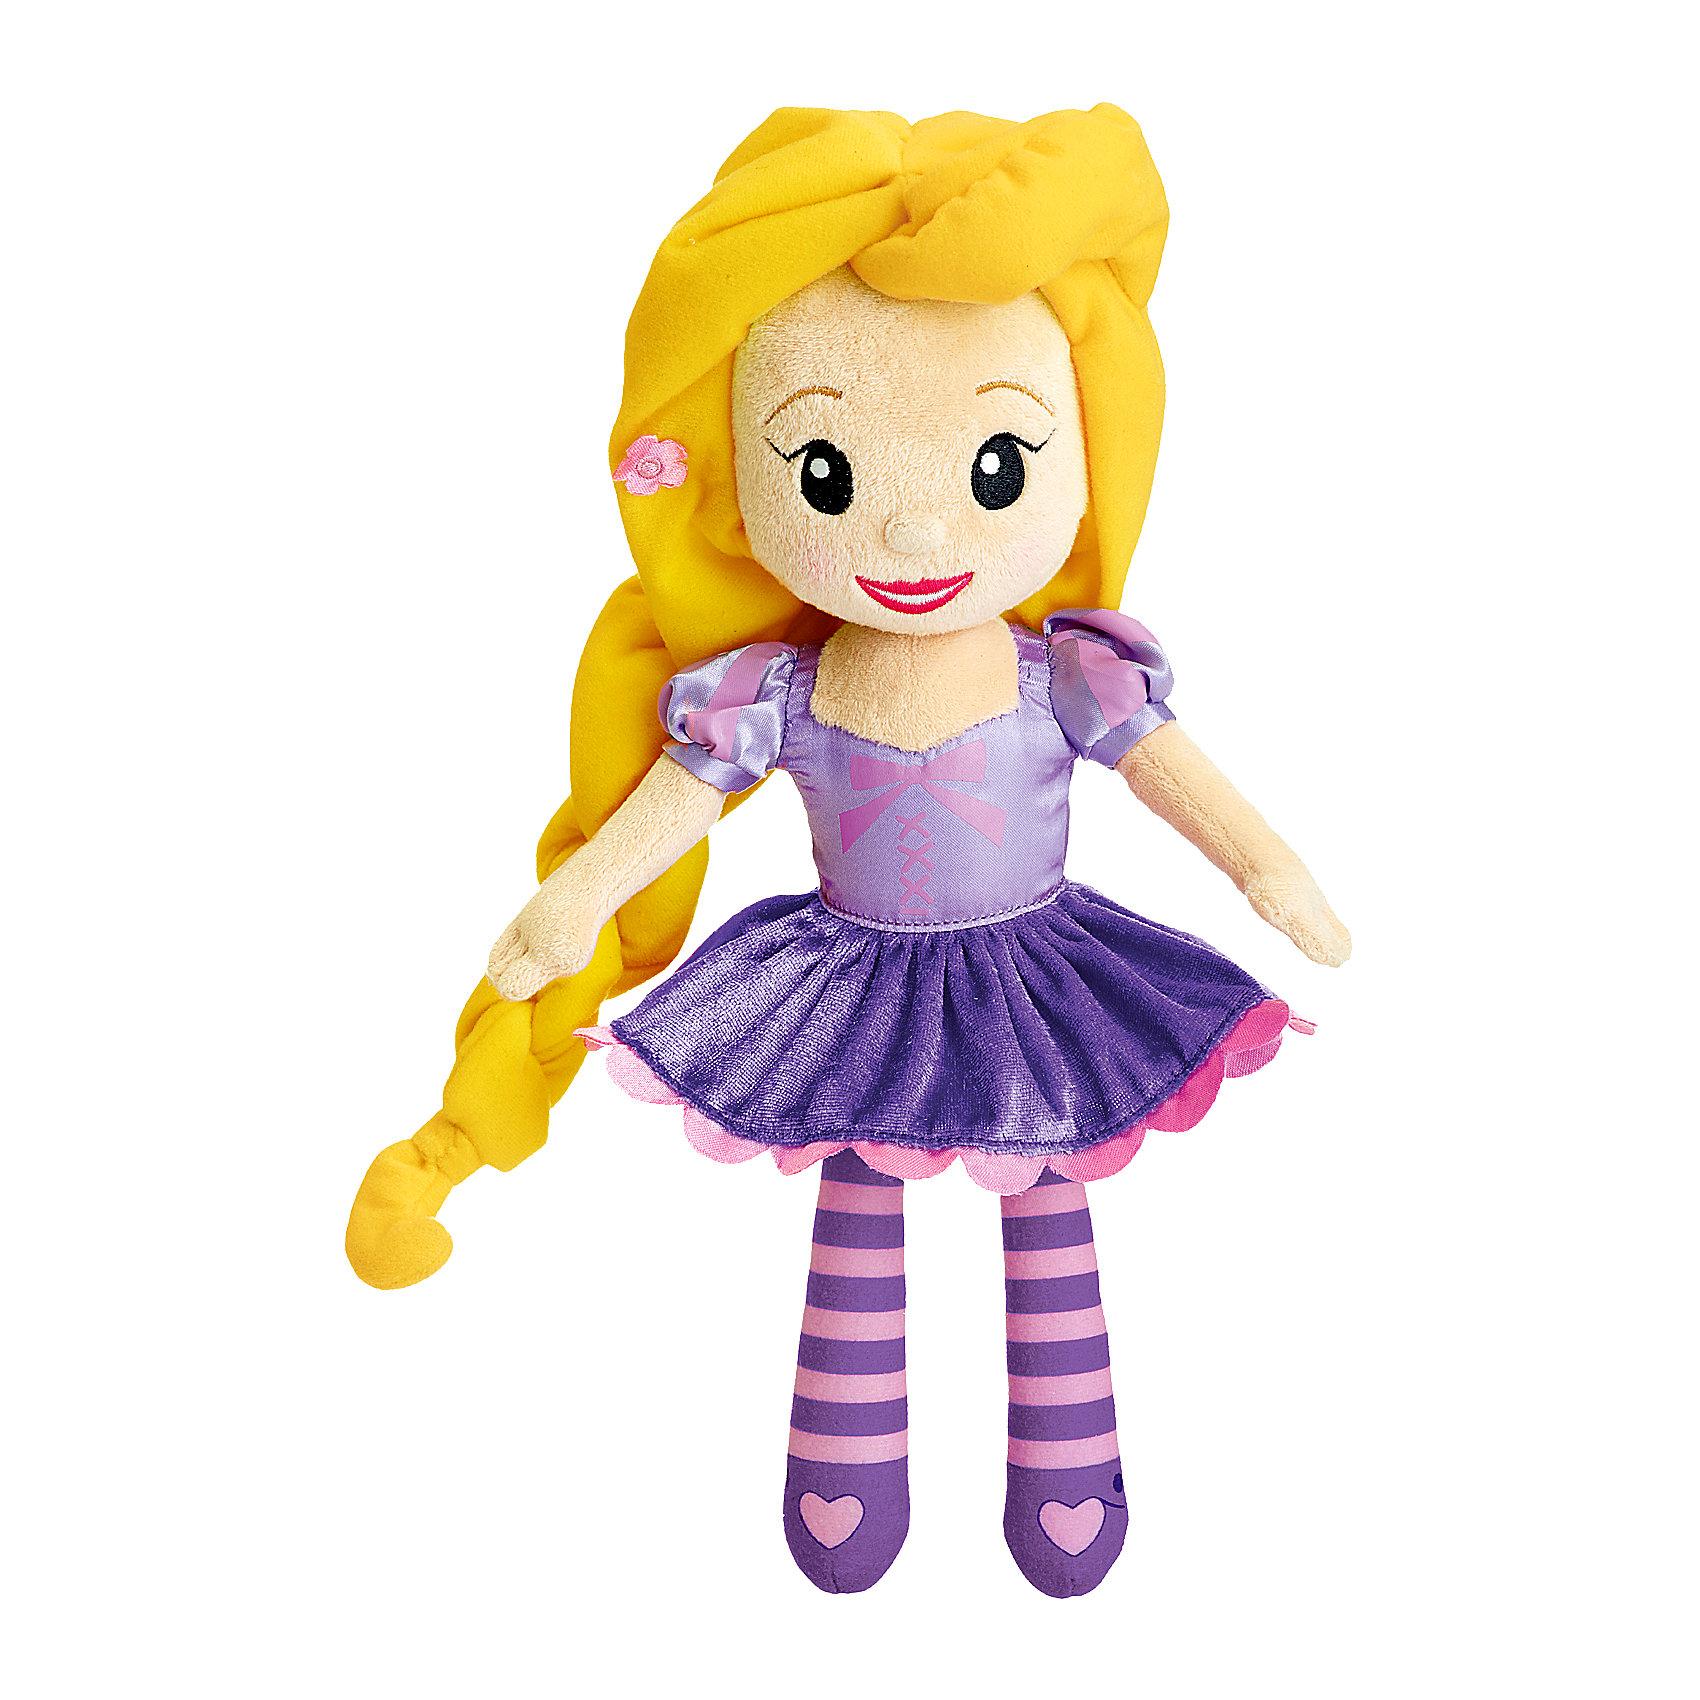 CHICCO Мягкая игрушка с мелодией Рапунцель, Disney, CHICCO chicco мягкая игрушкас с мелодией золушка disney chicco